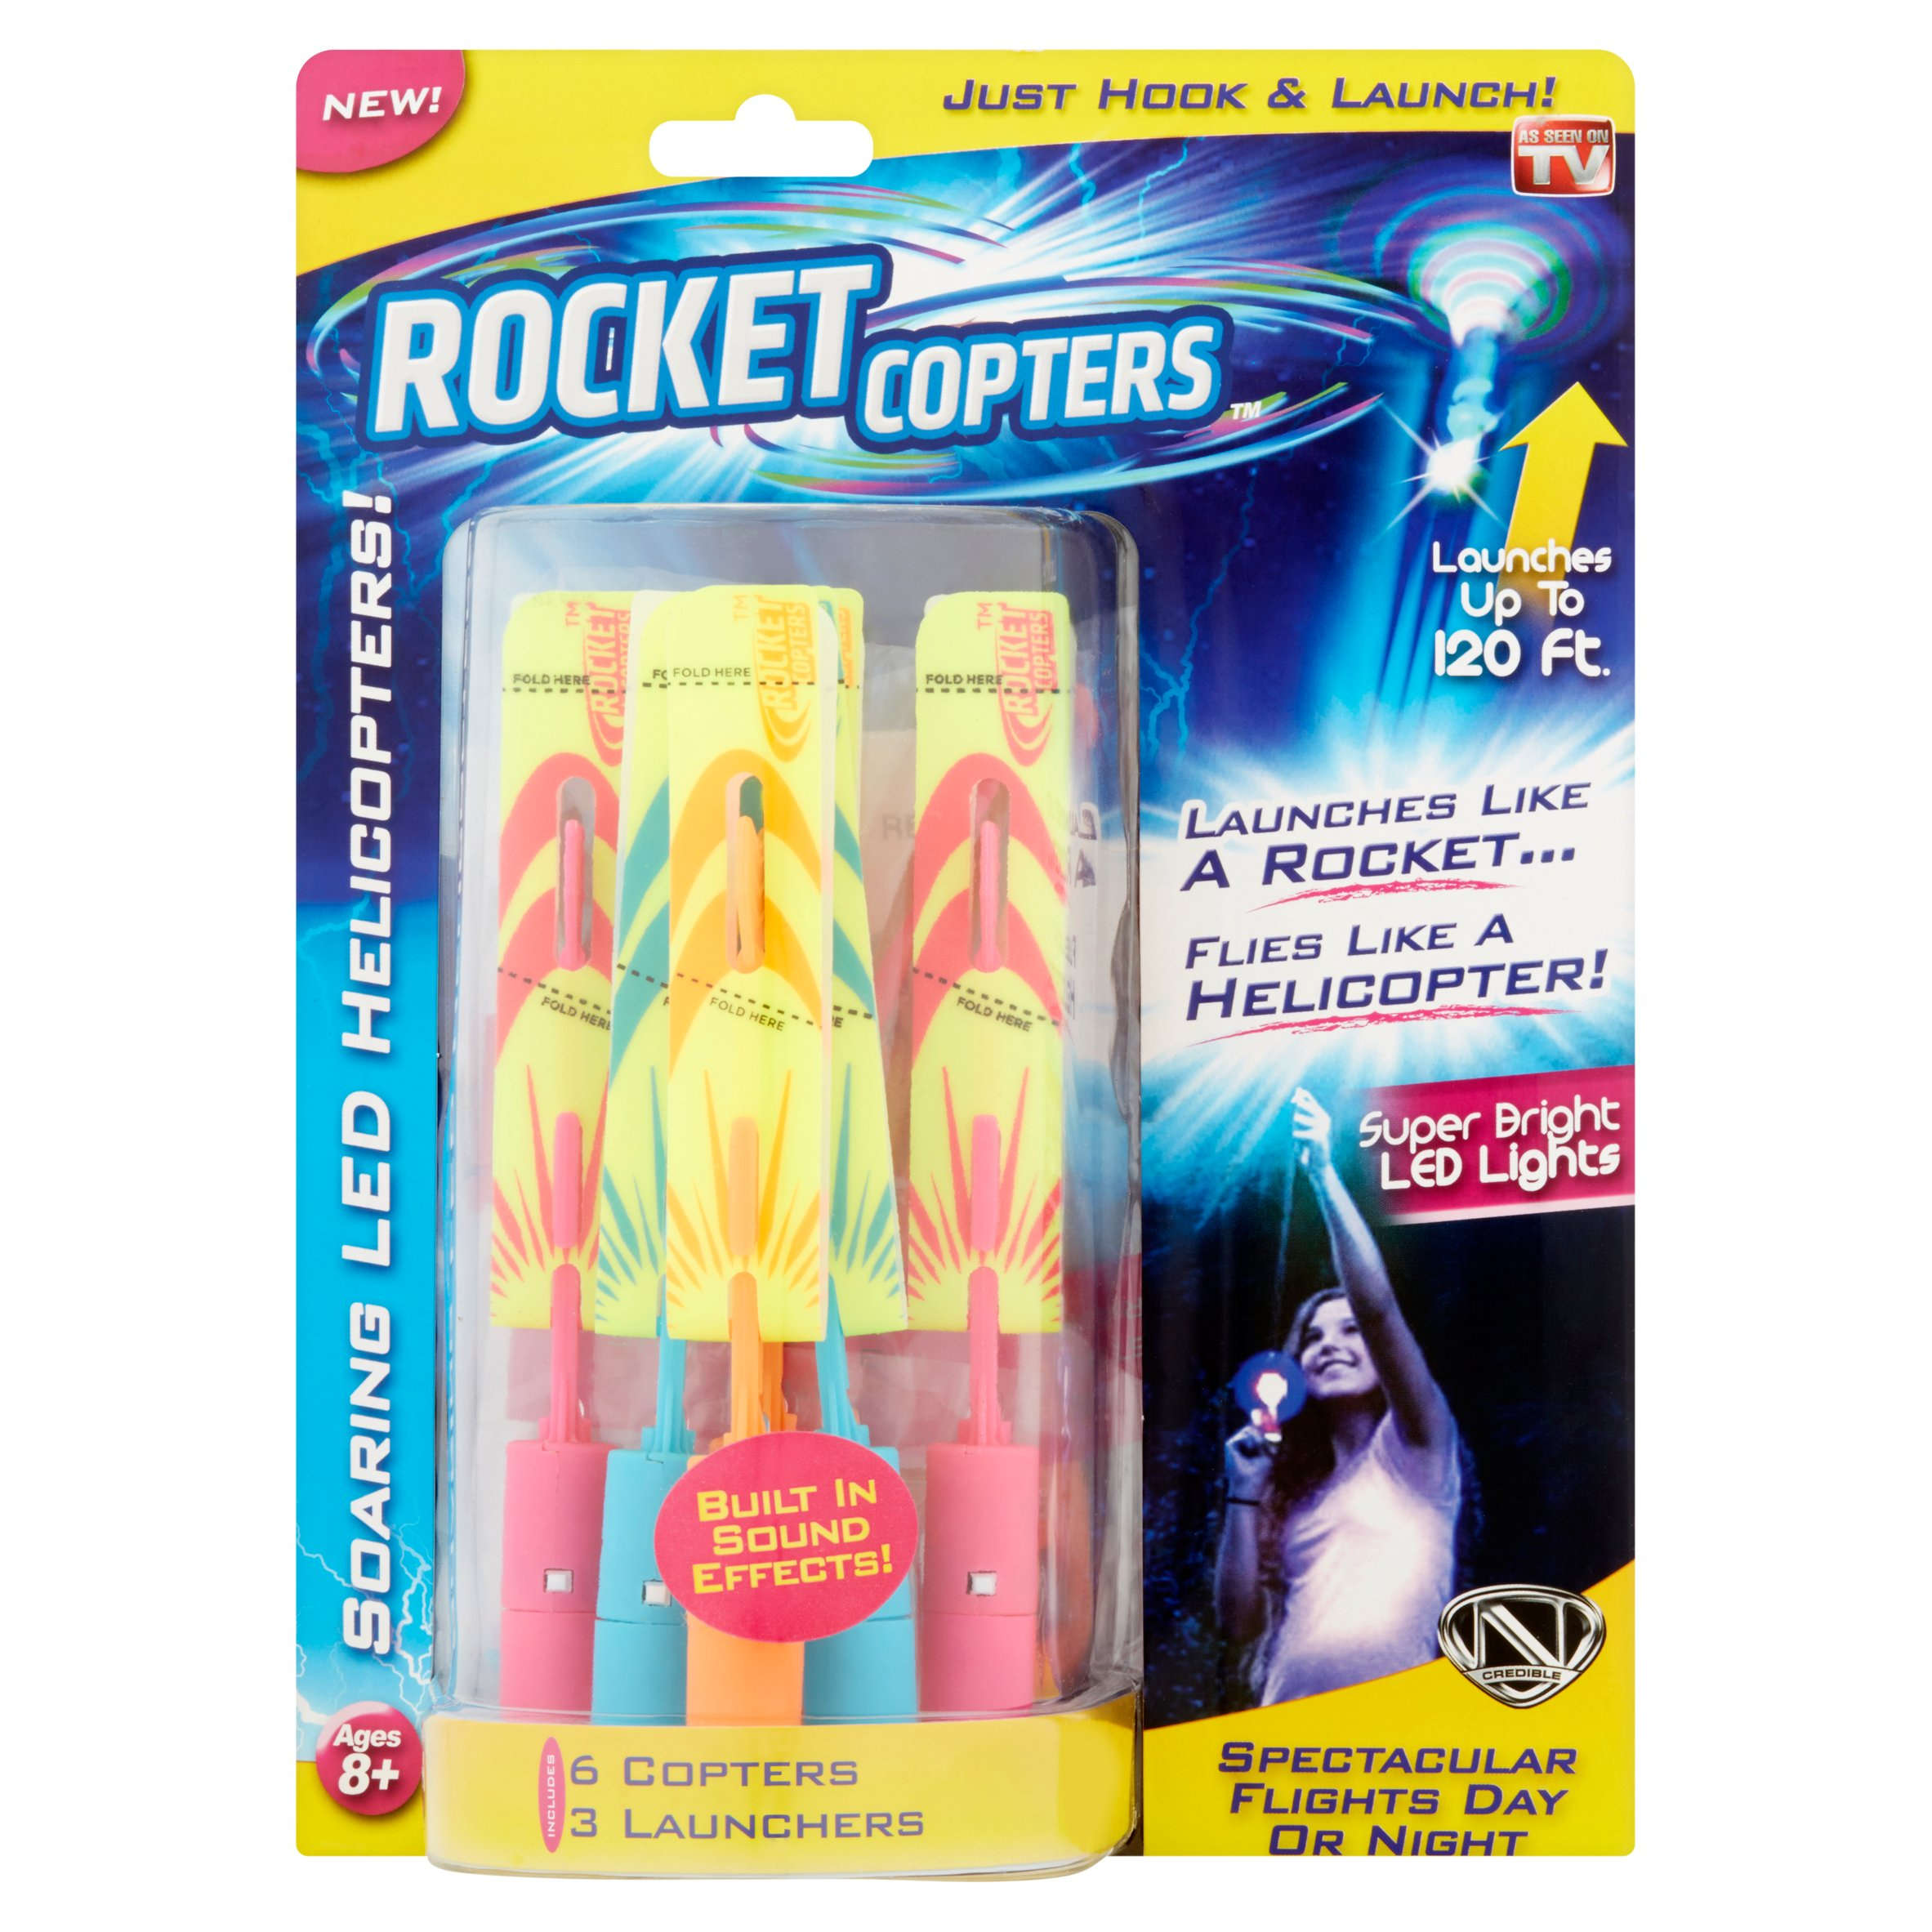 As Seen on TV Rocket Copters, Slingshot LED Heliptors